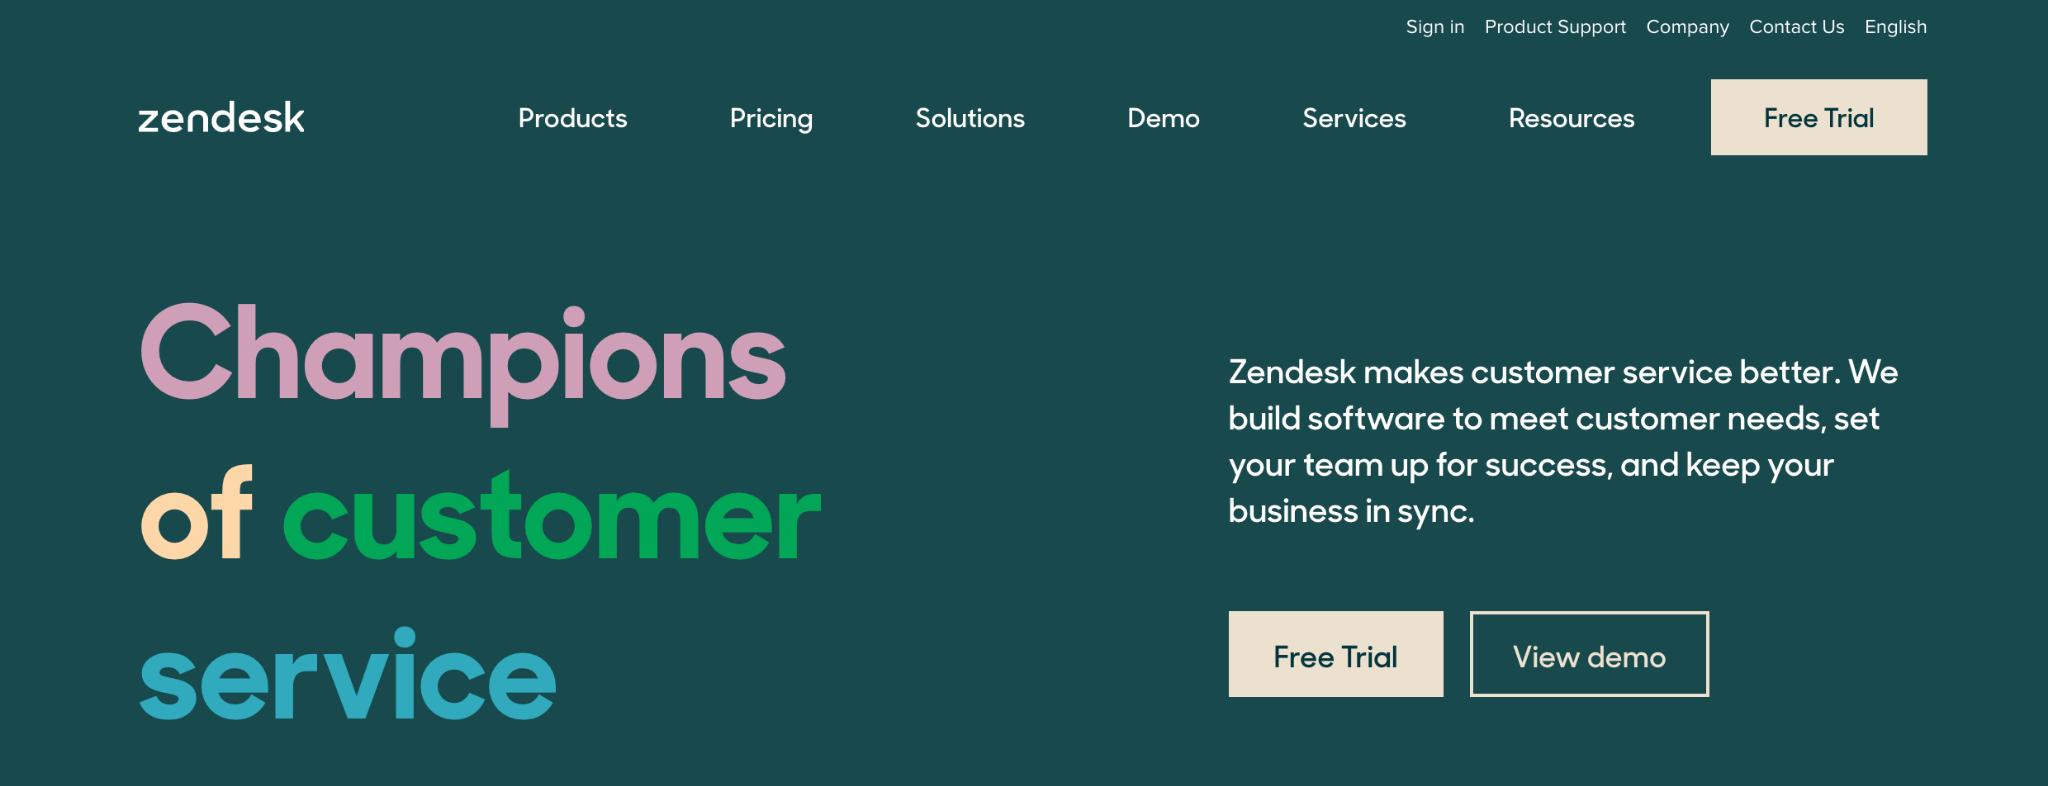 Zendesk homepage: Champions of Customer Service